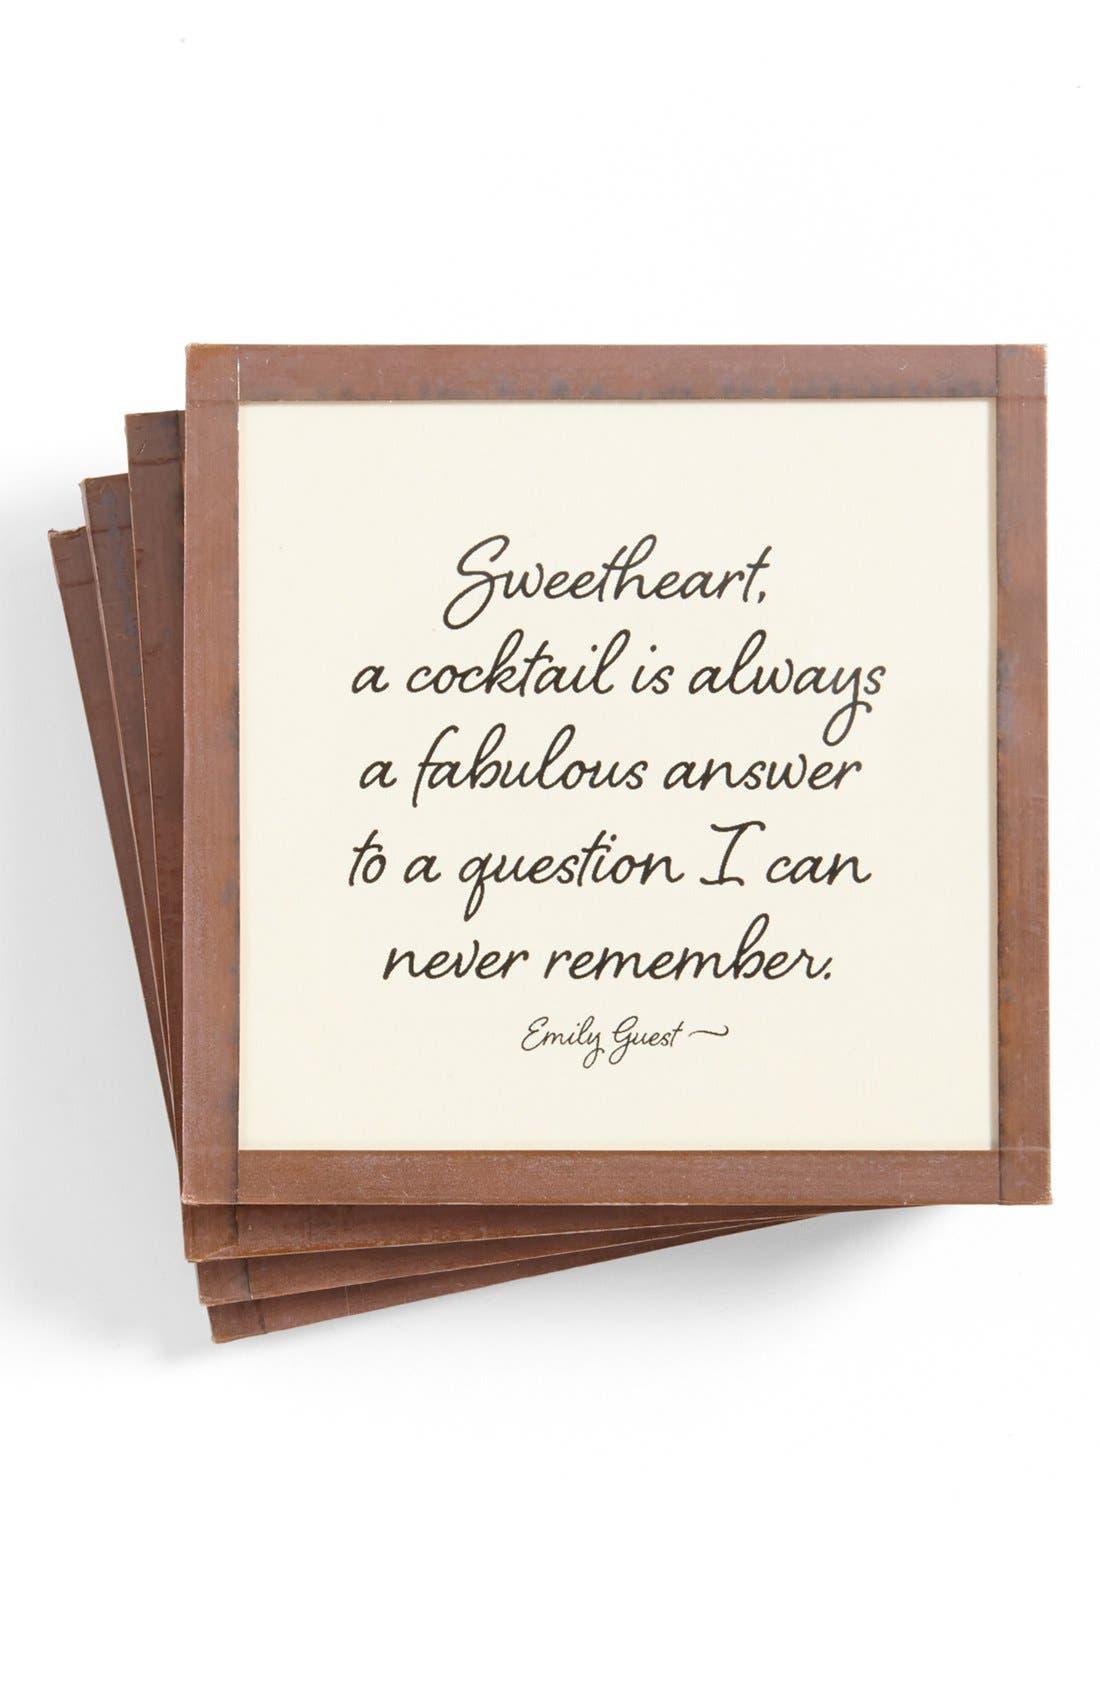 Alternate Image 1 Selected - Ben's Garden 'Sweetheart' Coasters (Set of 4)